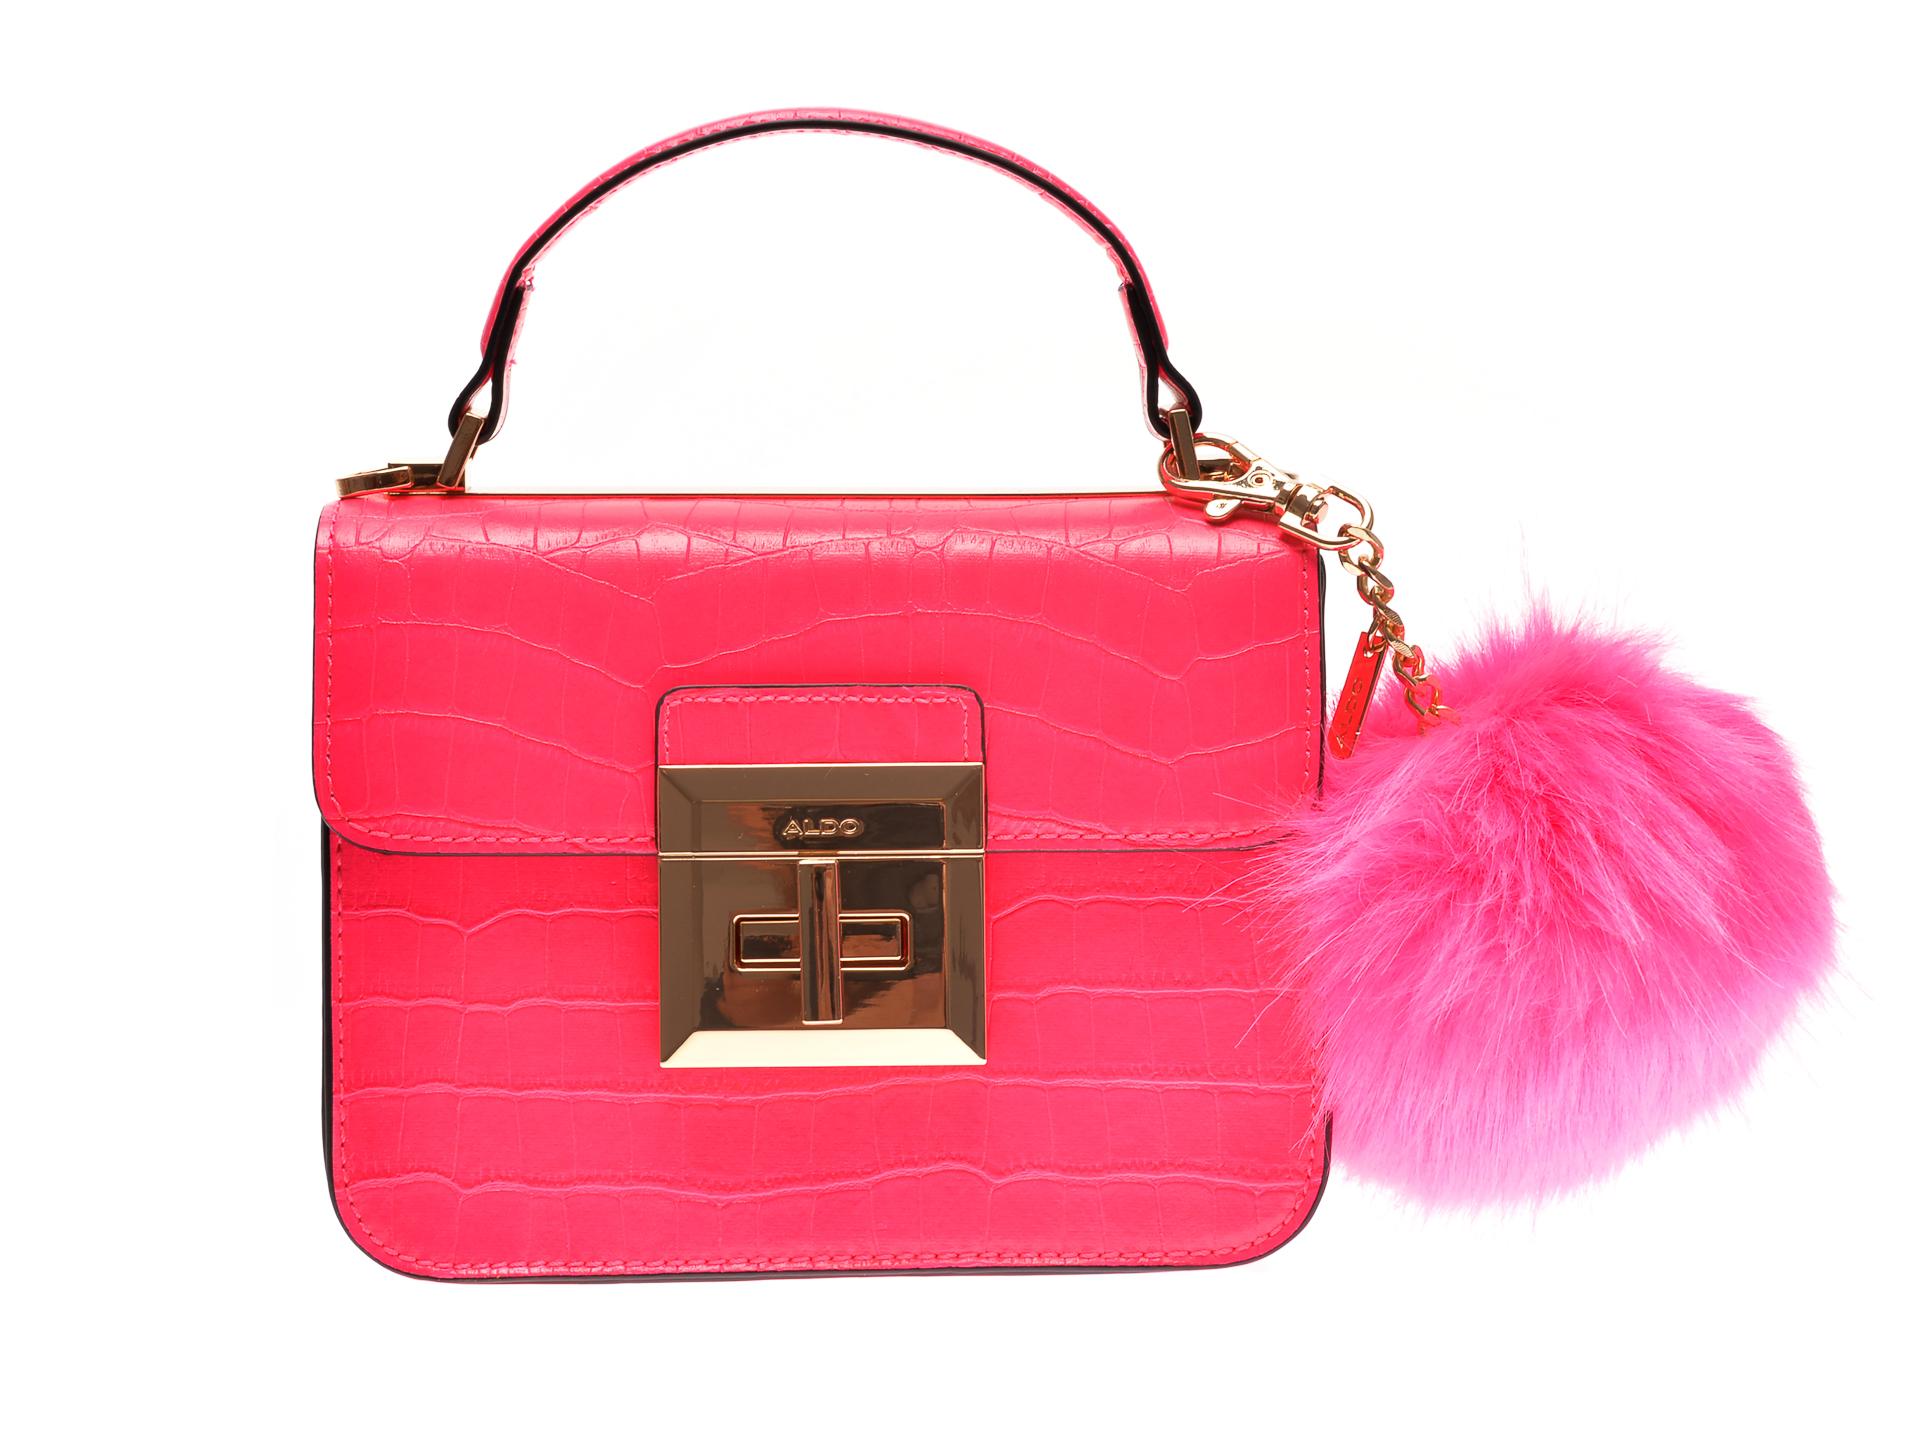 Poseta ALDO roz, Chiadda670, din piele ecologica imagine otter.ro 2021